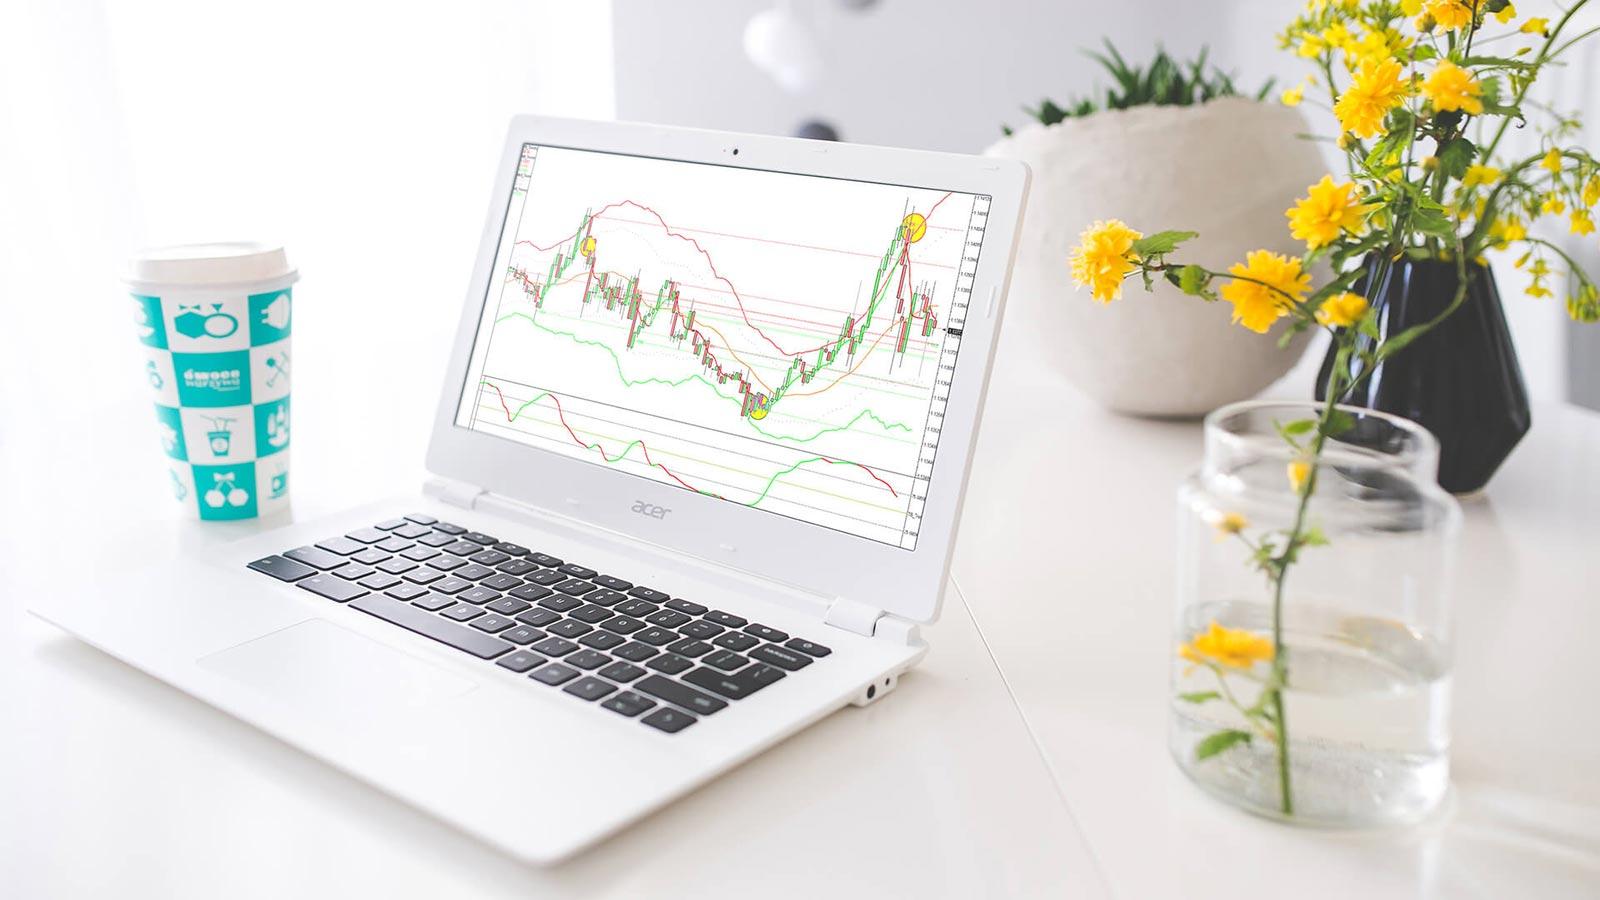 Forex micro account oanda trading